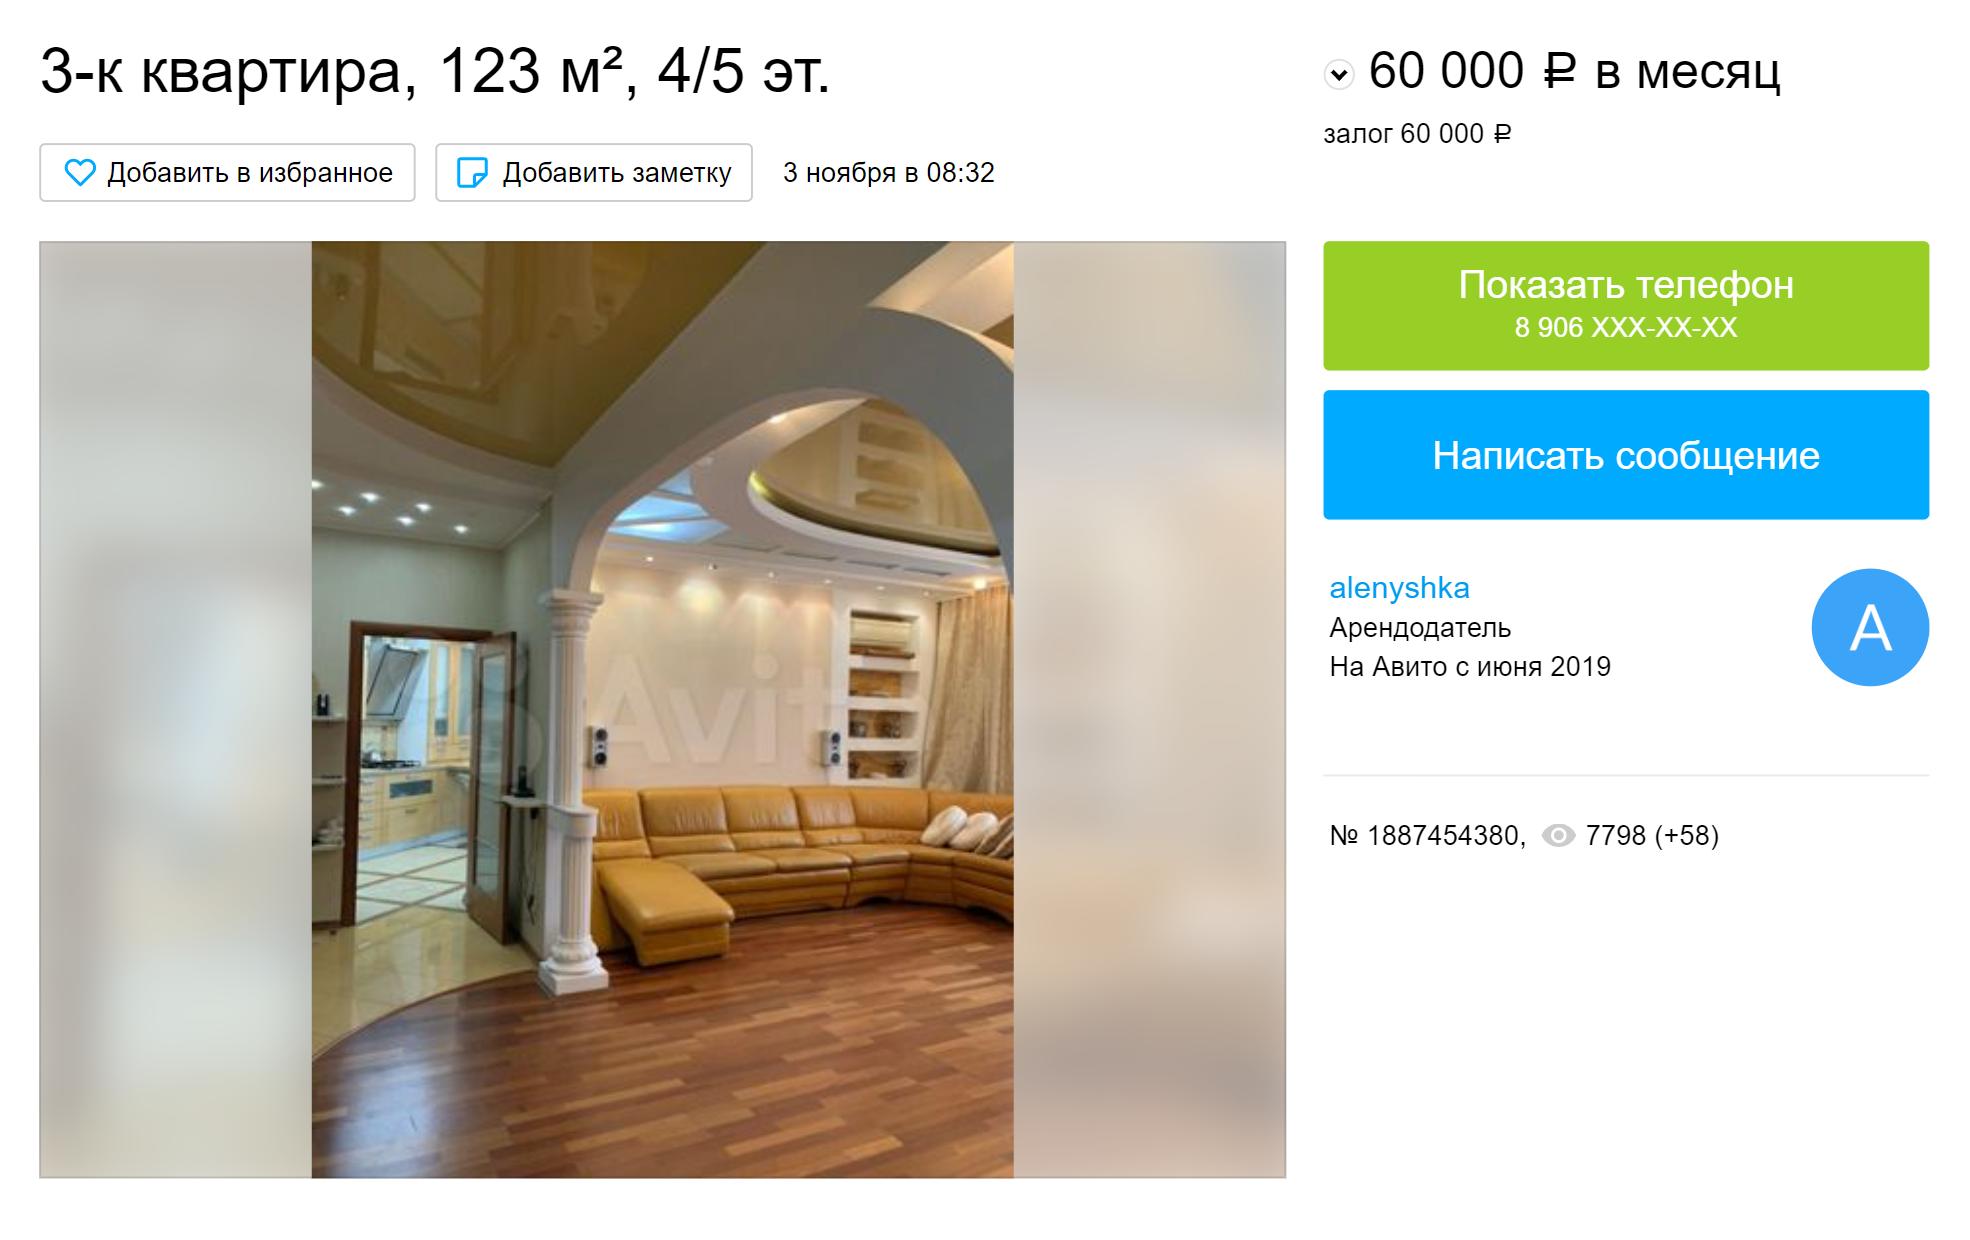 Самая дорогая квартира на&nbsp;«Авито» — трешка в&nbsp;микрорайоне Волжский-3. Она стоит 60&nbsp;000&nbsp;<span class=ruble>Р</span> в&nbsp;месяц